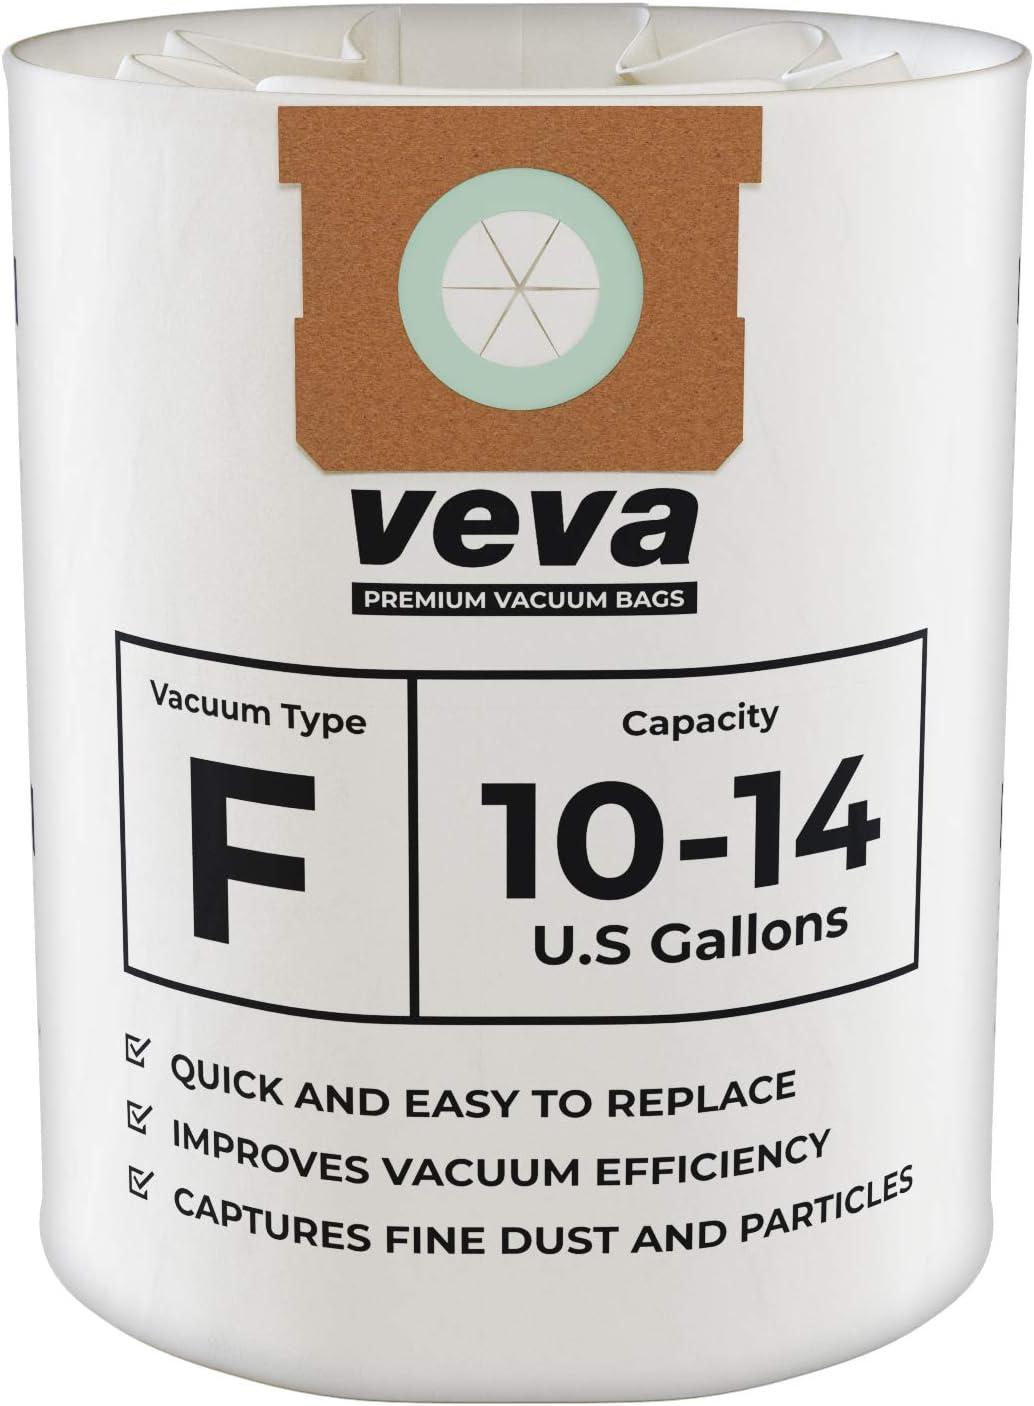 VEVA 15 Pack Premium Vacuum Filter Bags Type F 9066200 Work with Shop Vac 10-14 Gallon Vacuum, Part # SV Shopvac Shop-Vac 90662